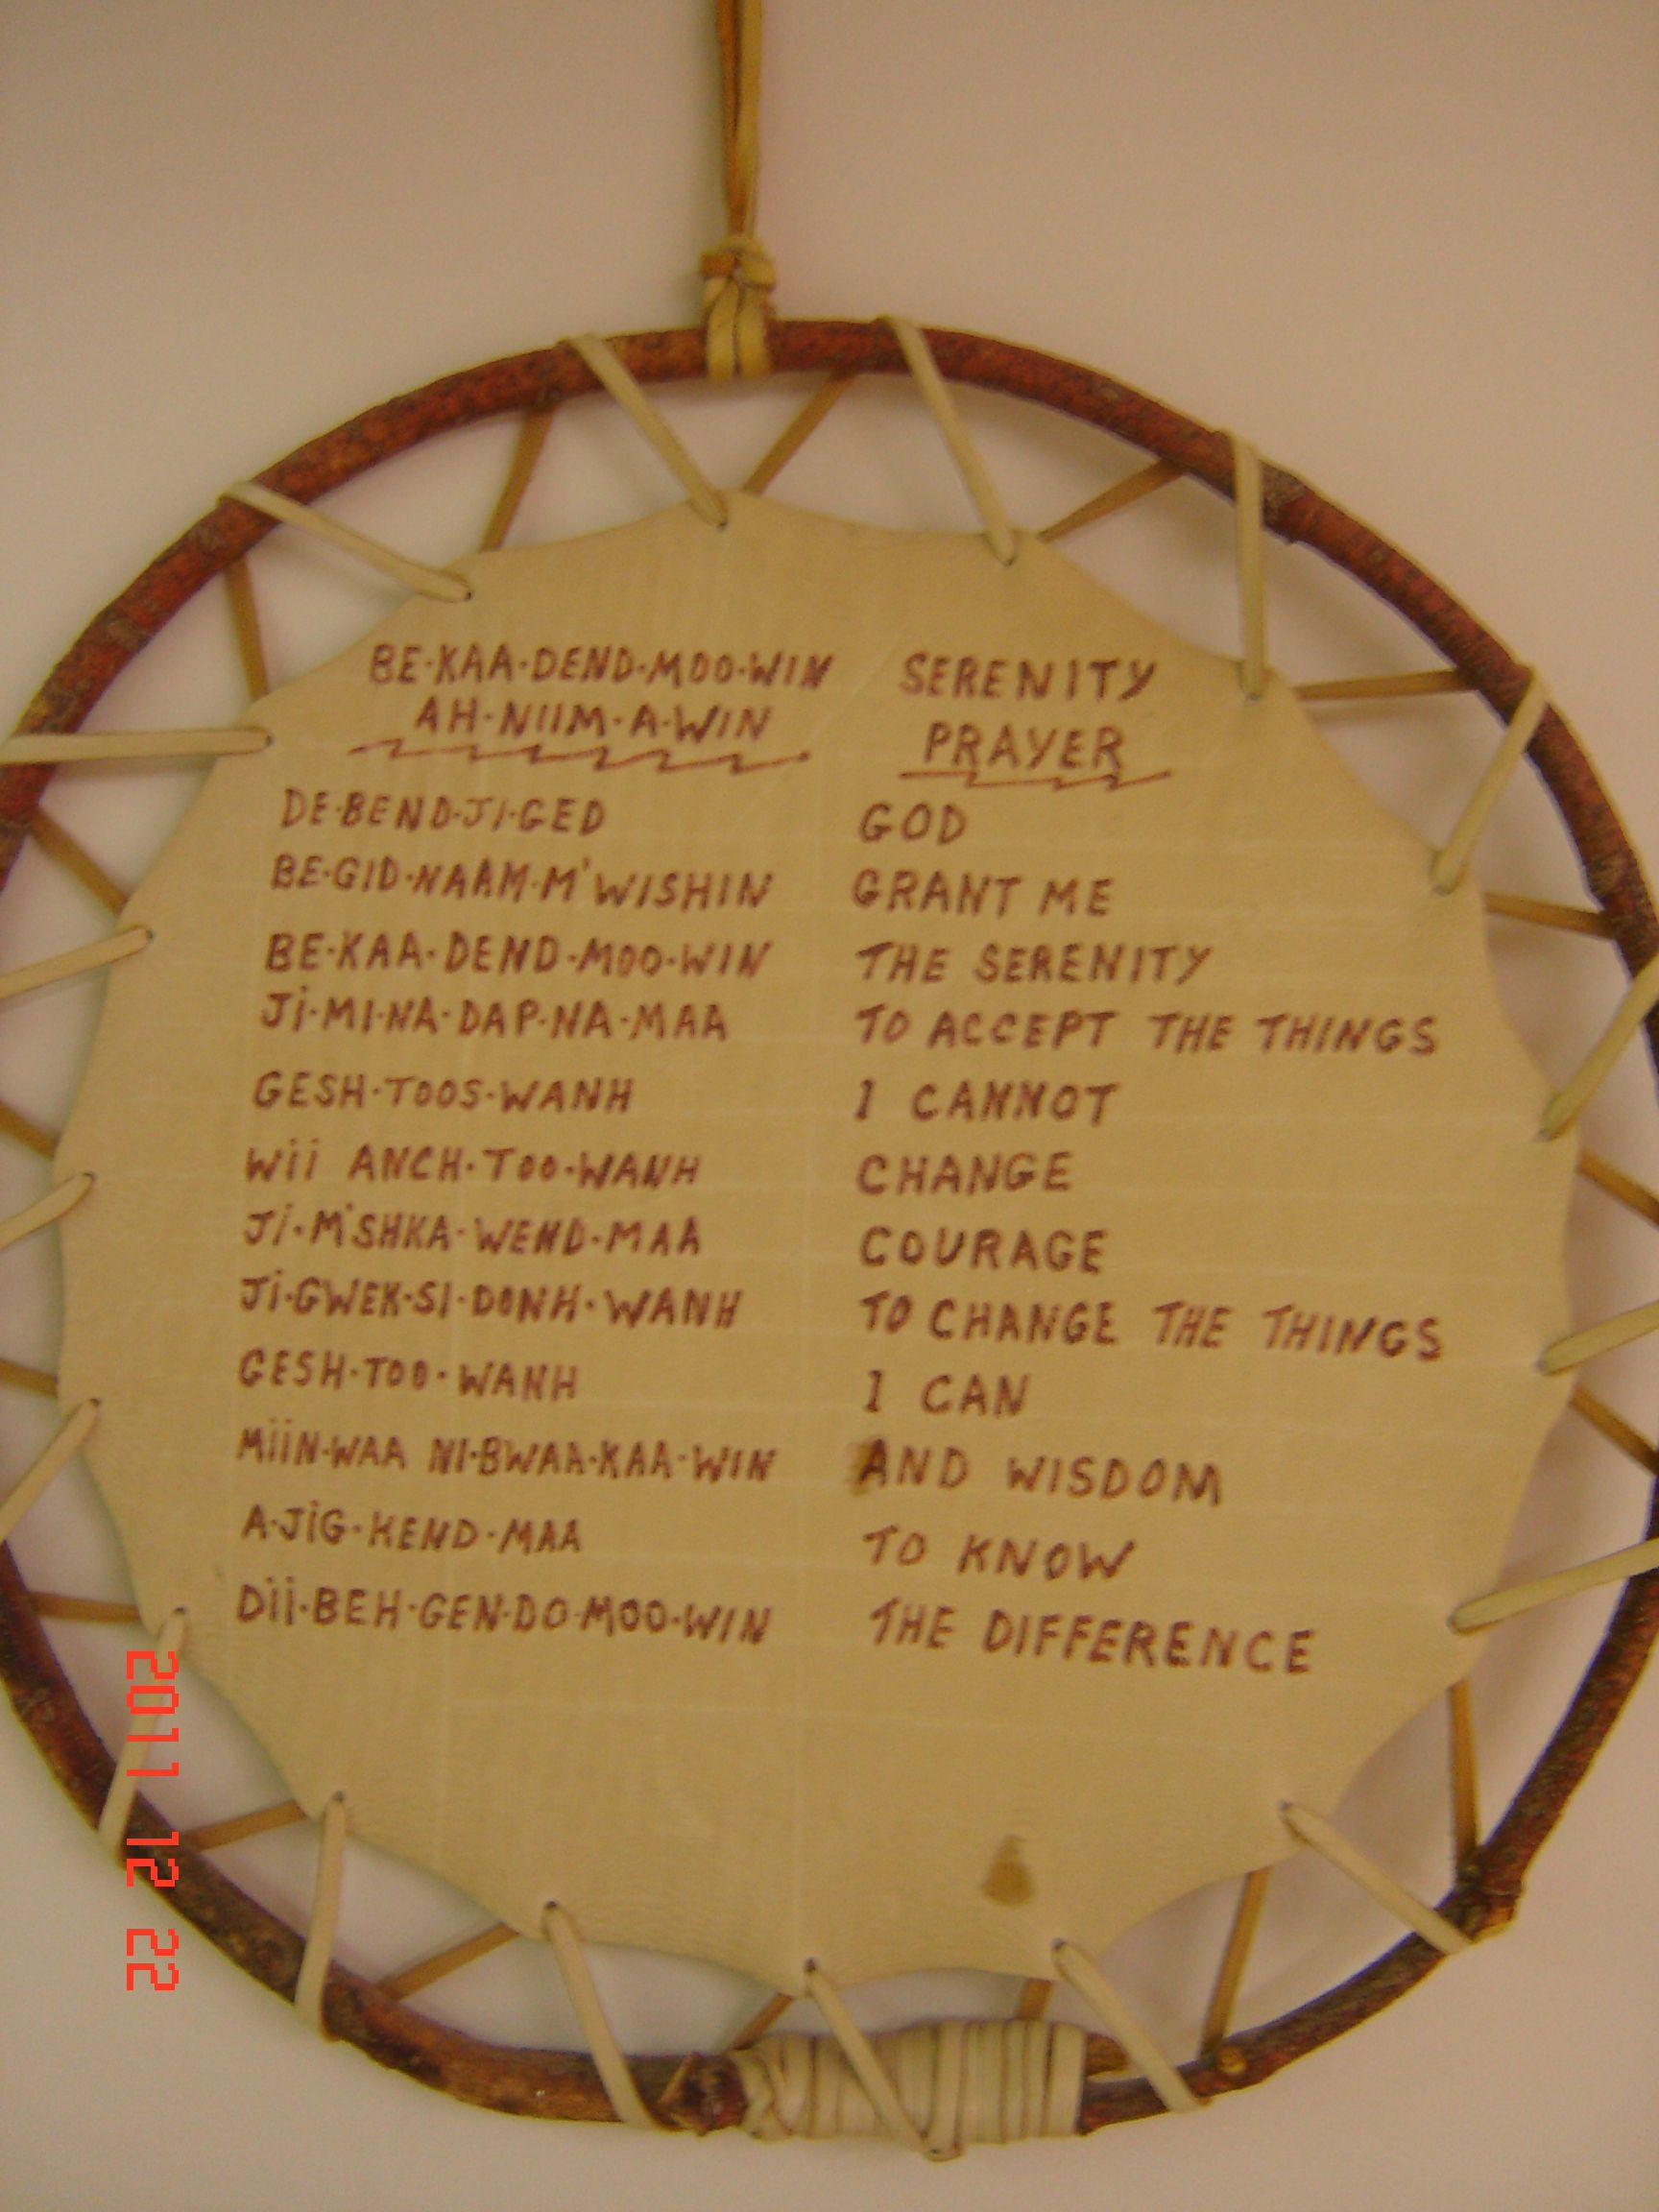 worksheet Serenity Prayer Worksheet the serenity prayer in ojibway wikwemikong native quilt and wikwemikong